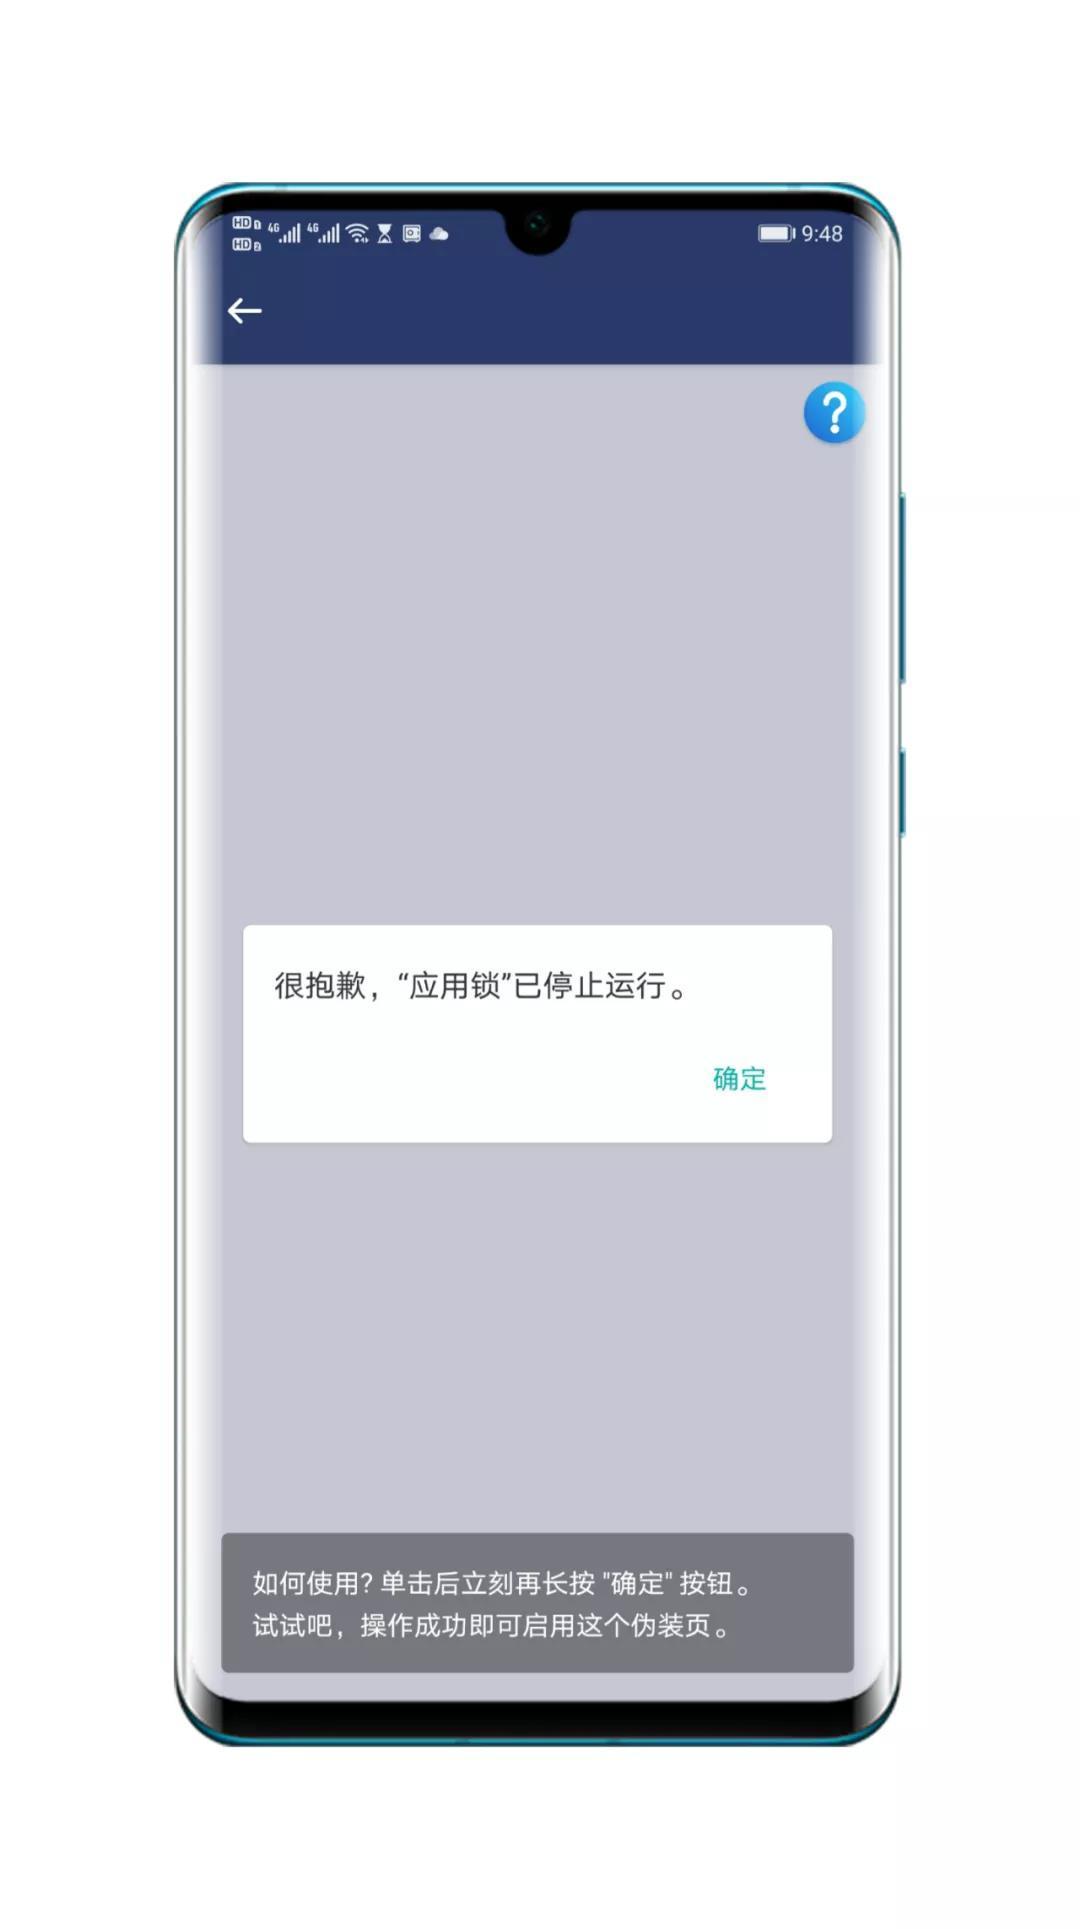 5faf5a3f1cd1bbb86bd5bc8d 多种方法隐藏、伪装你手机里的应用、图片、文档等文件--应用锁